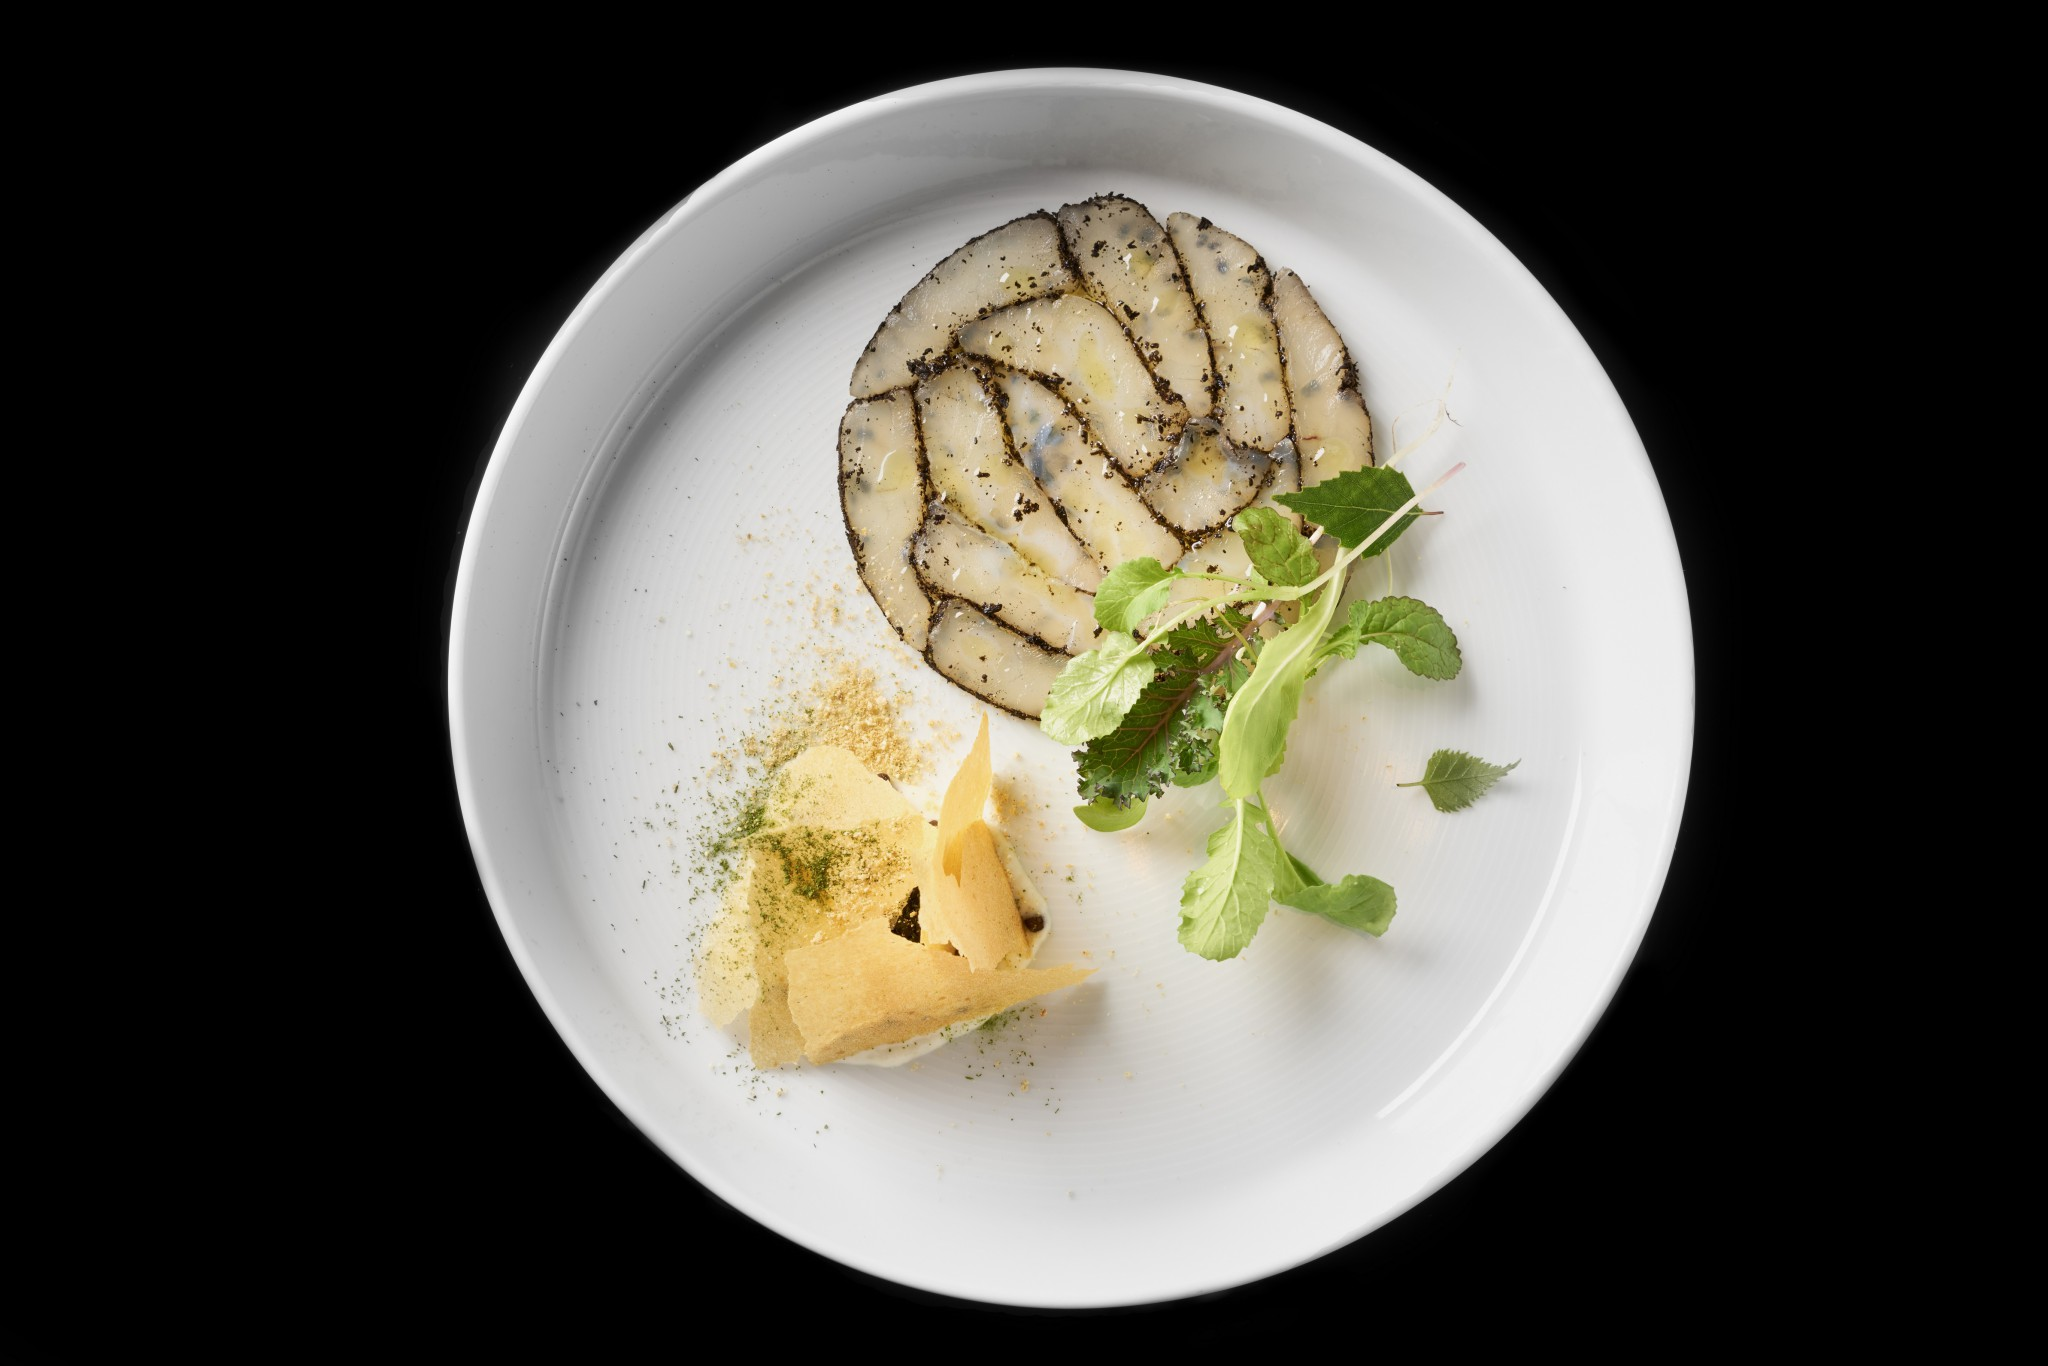 CANDÁT OBECNÝ marinovaný a pěna, čočka Beluga, houbový, citronový a libečkový prach, bramborový papír, kaviár ze sleďů